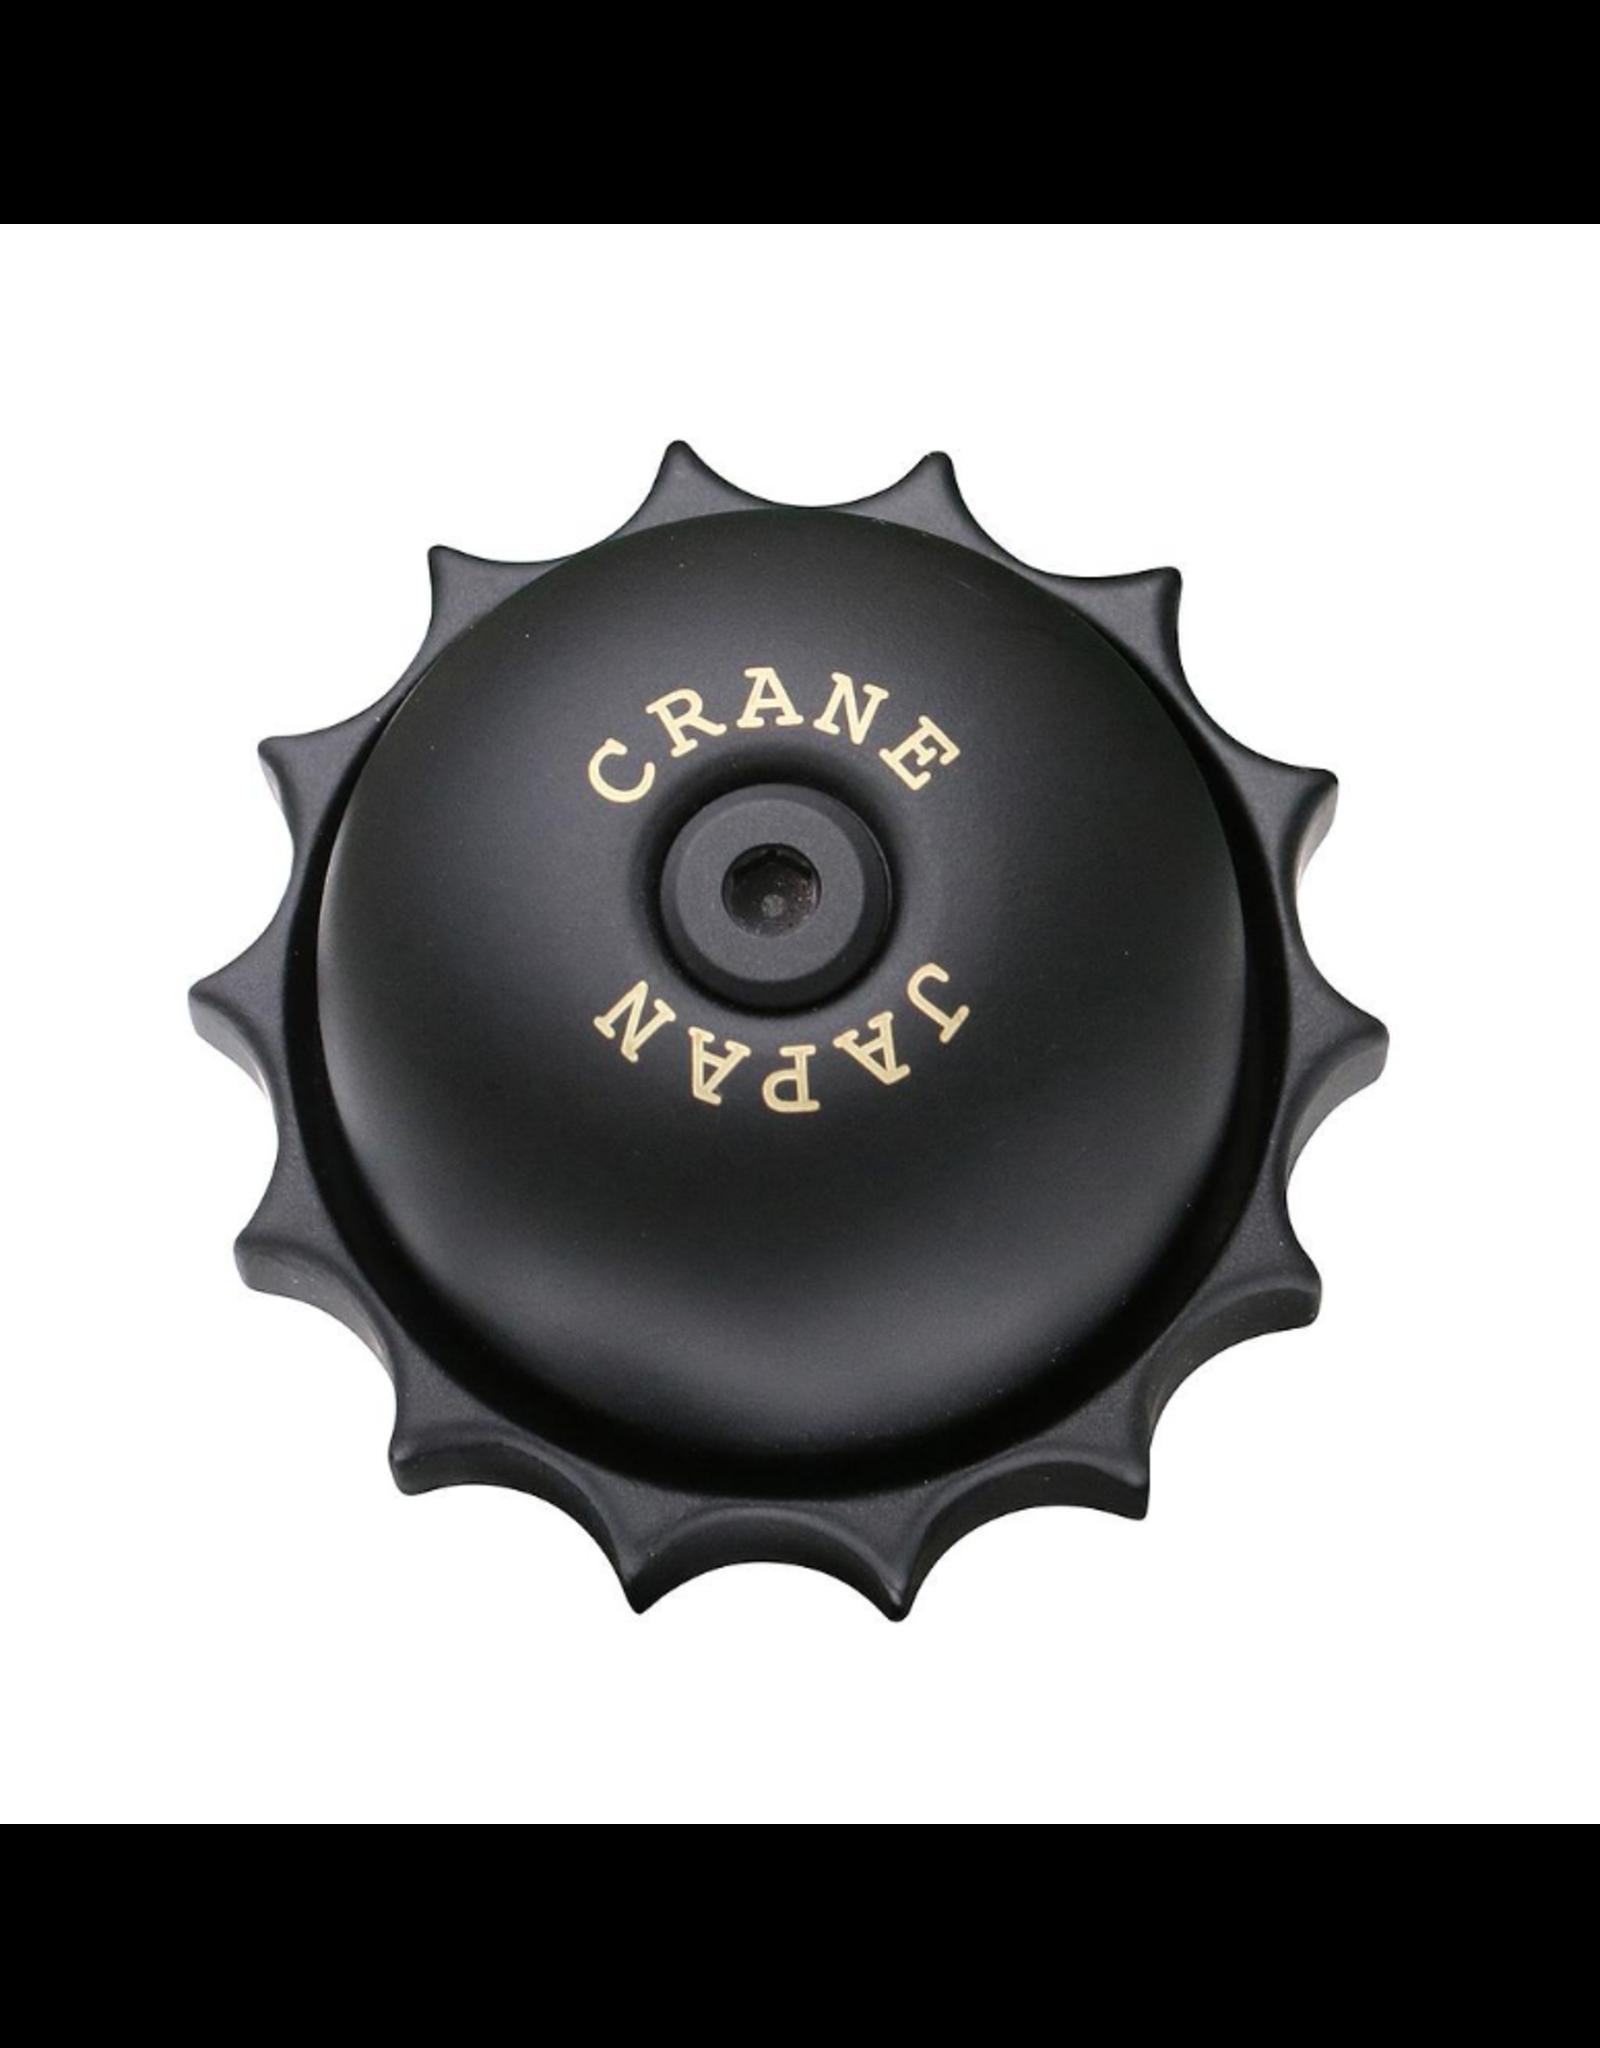 Crane Bell Co Crane E-Ne Revolver Brass Bell - Stealth Black